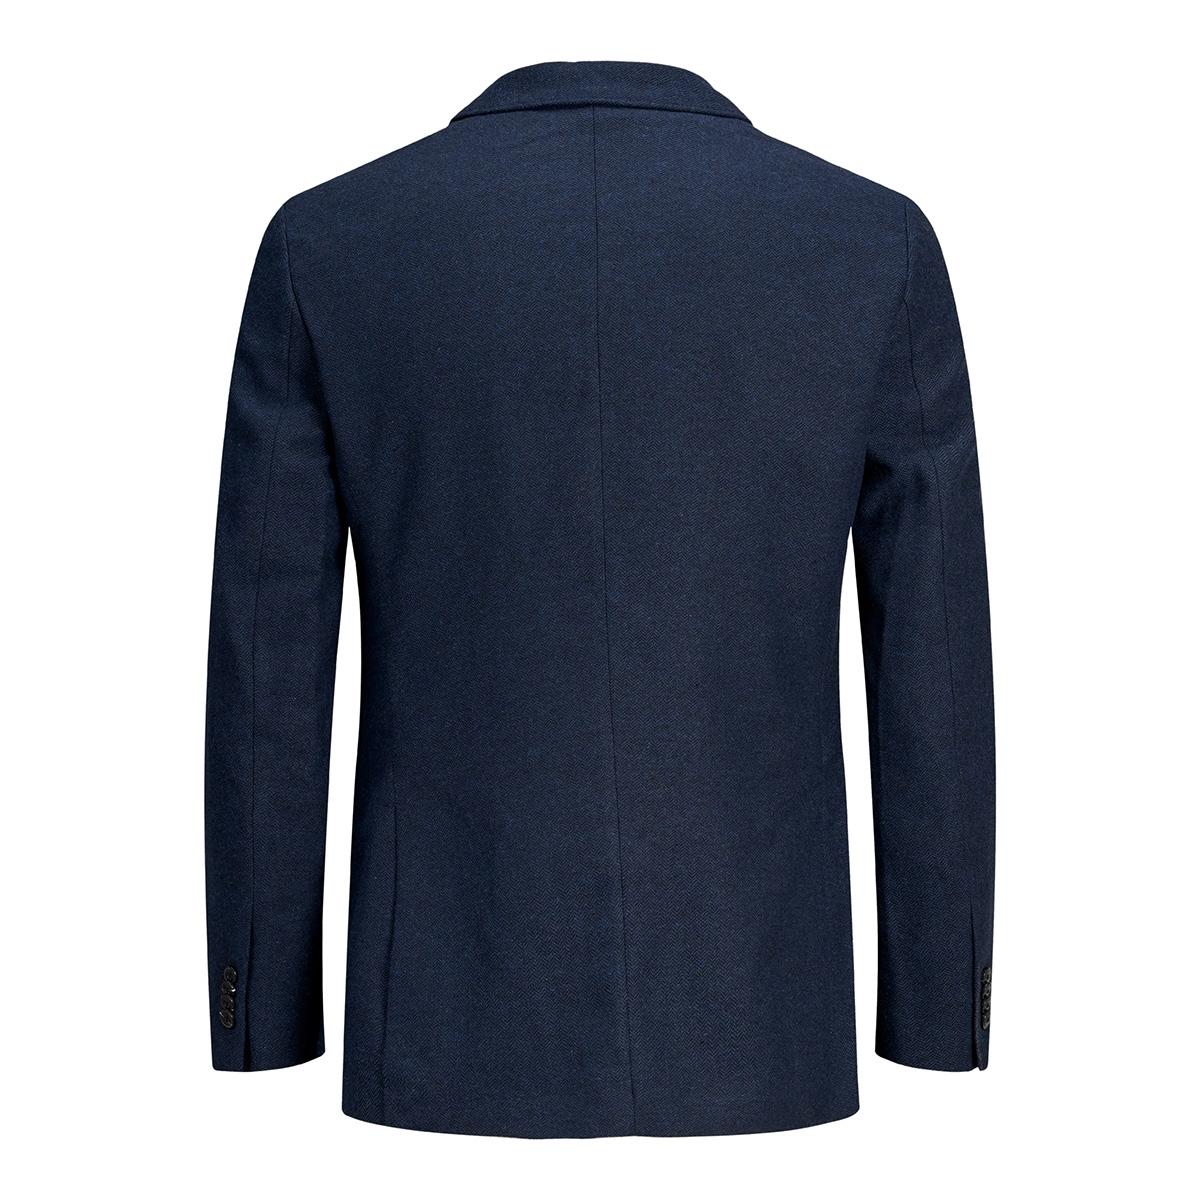 jprcolton  hawk blazer sts 12161344 jack & jones colbert dark navy/slim fit